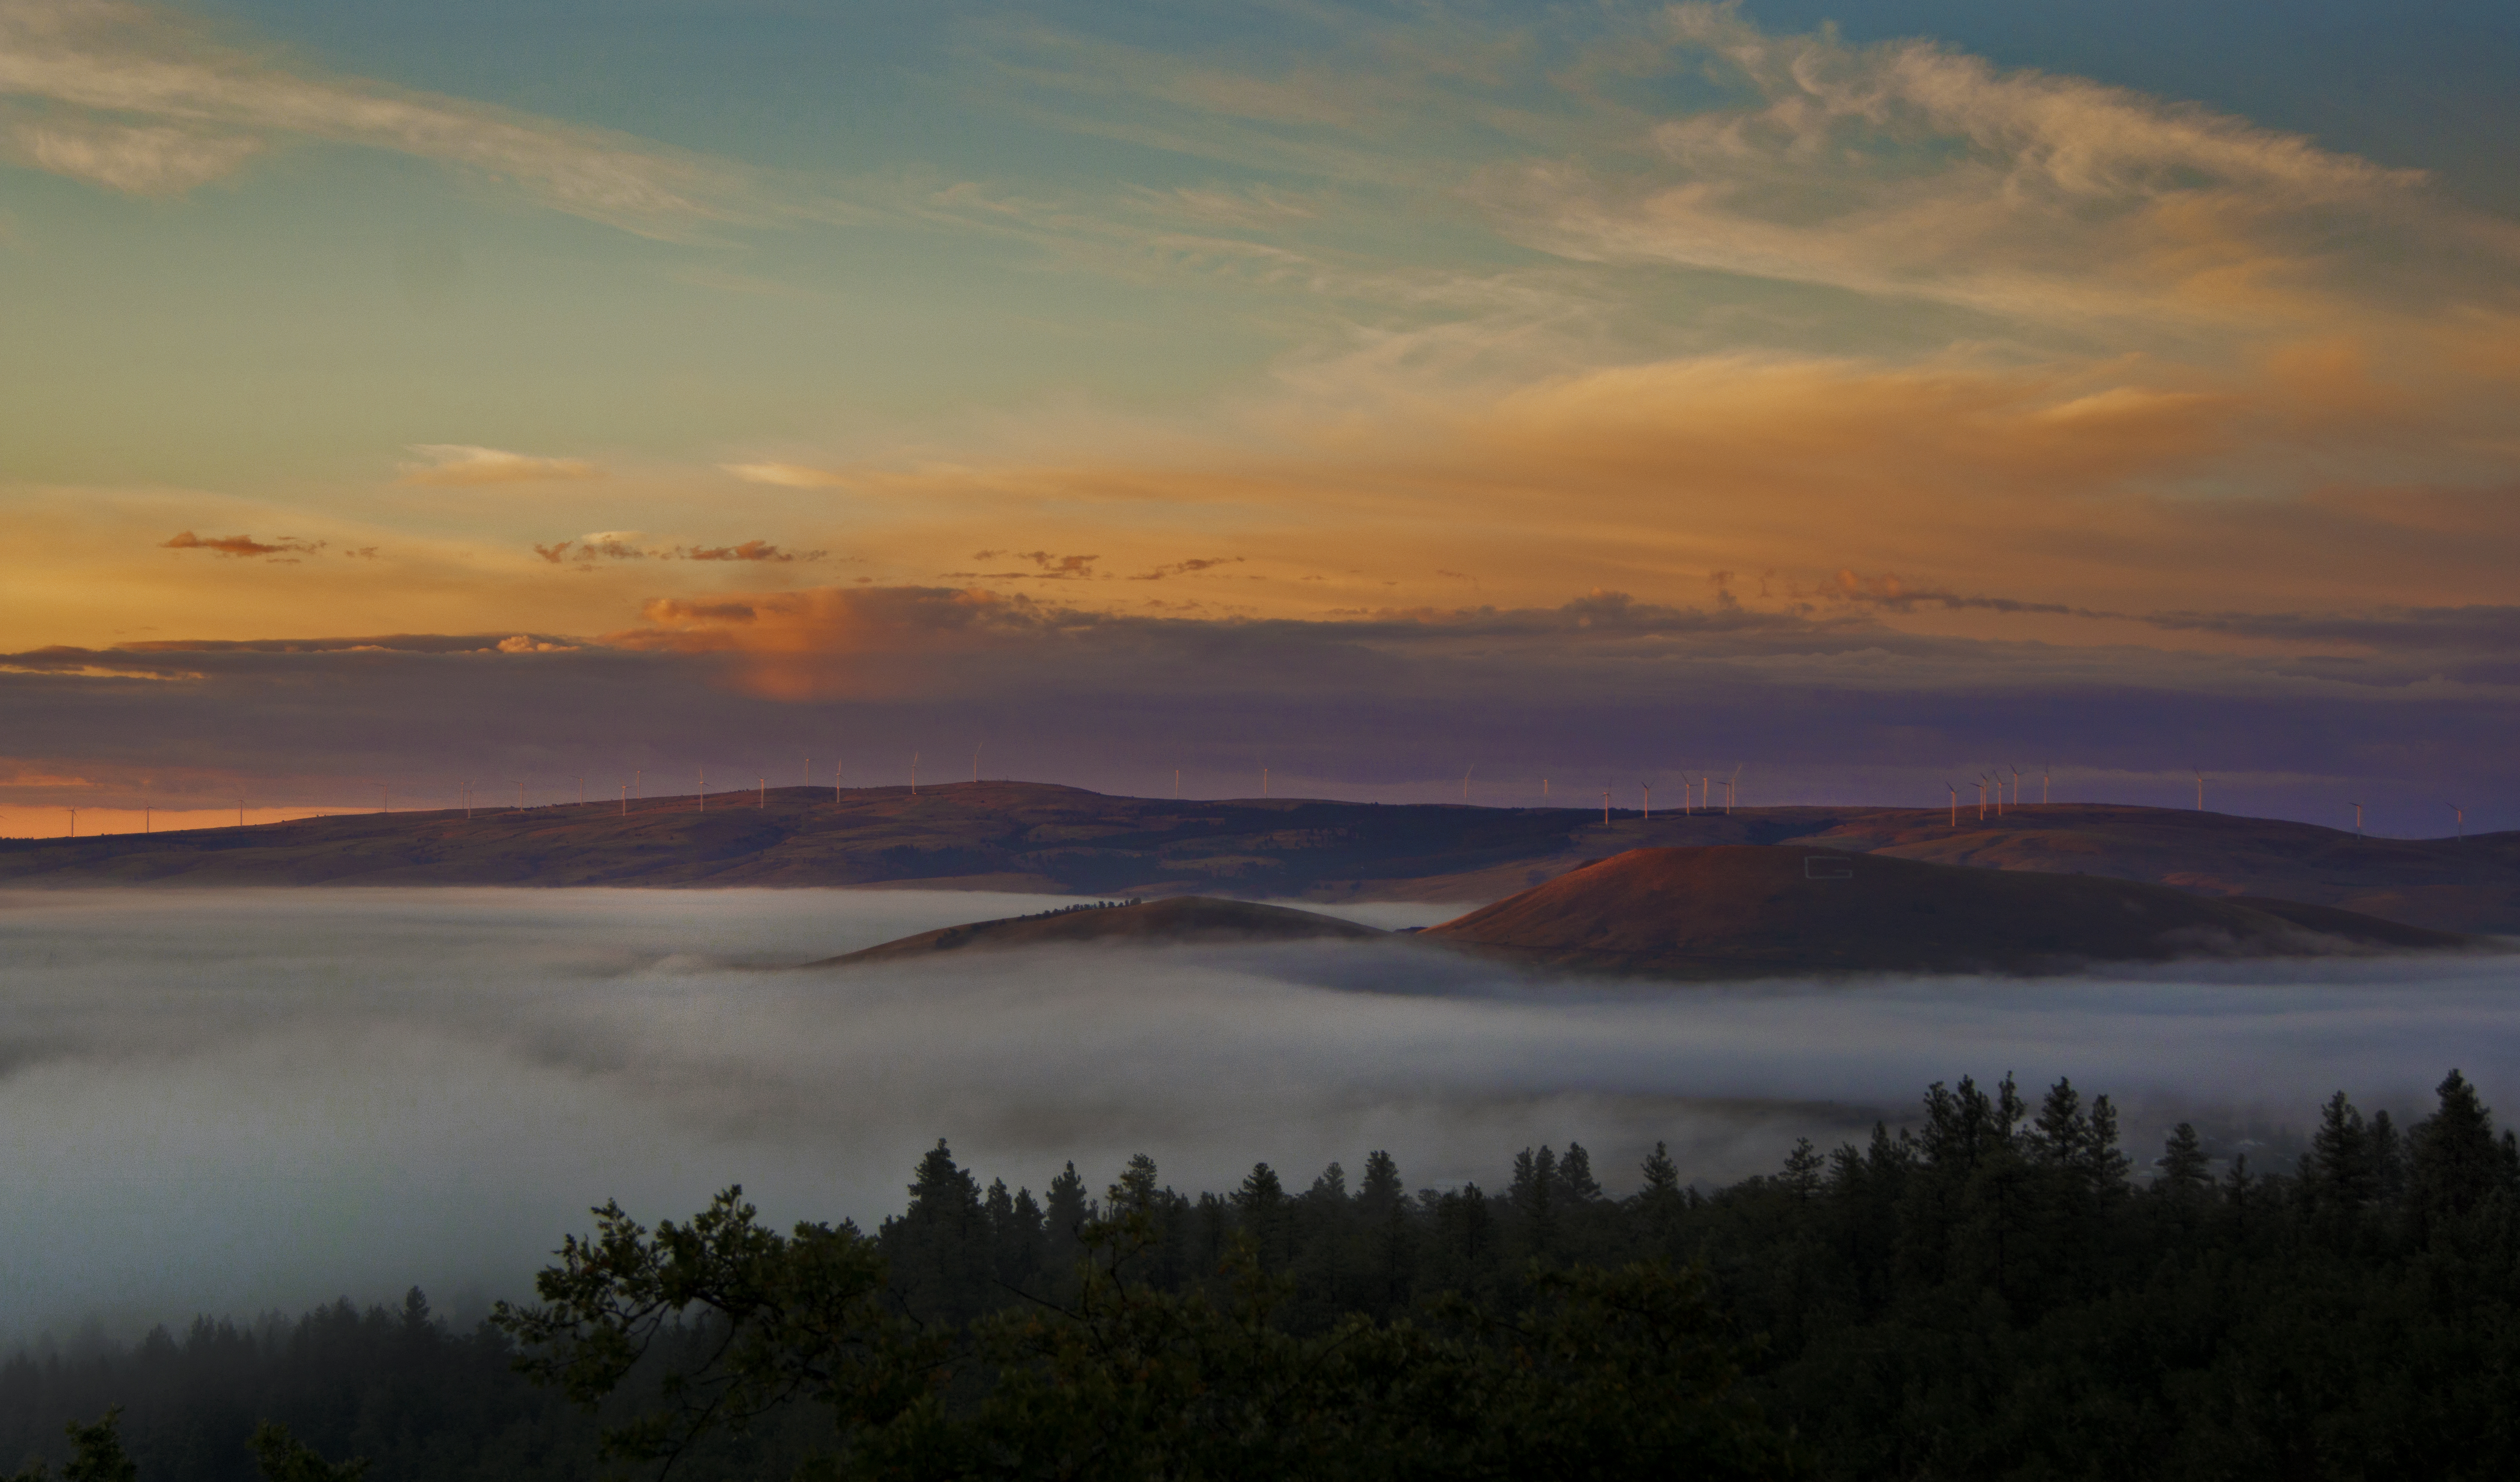 Washington State Parks and Recreation Commission, WA